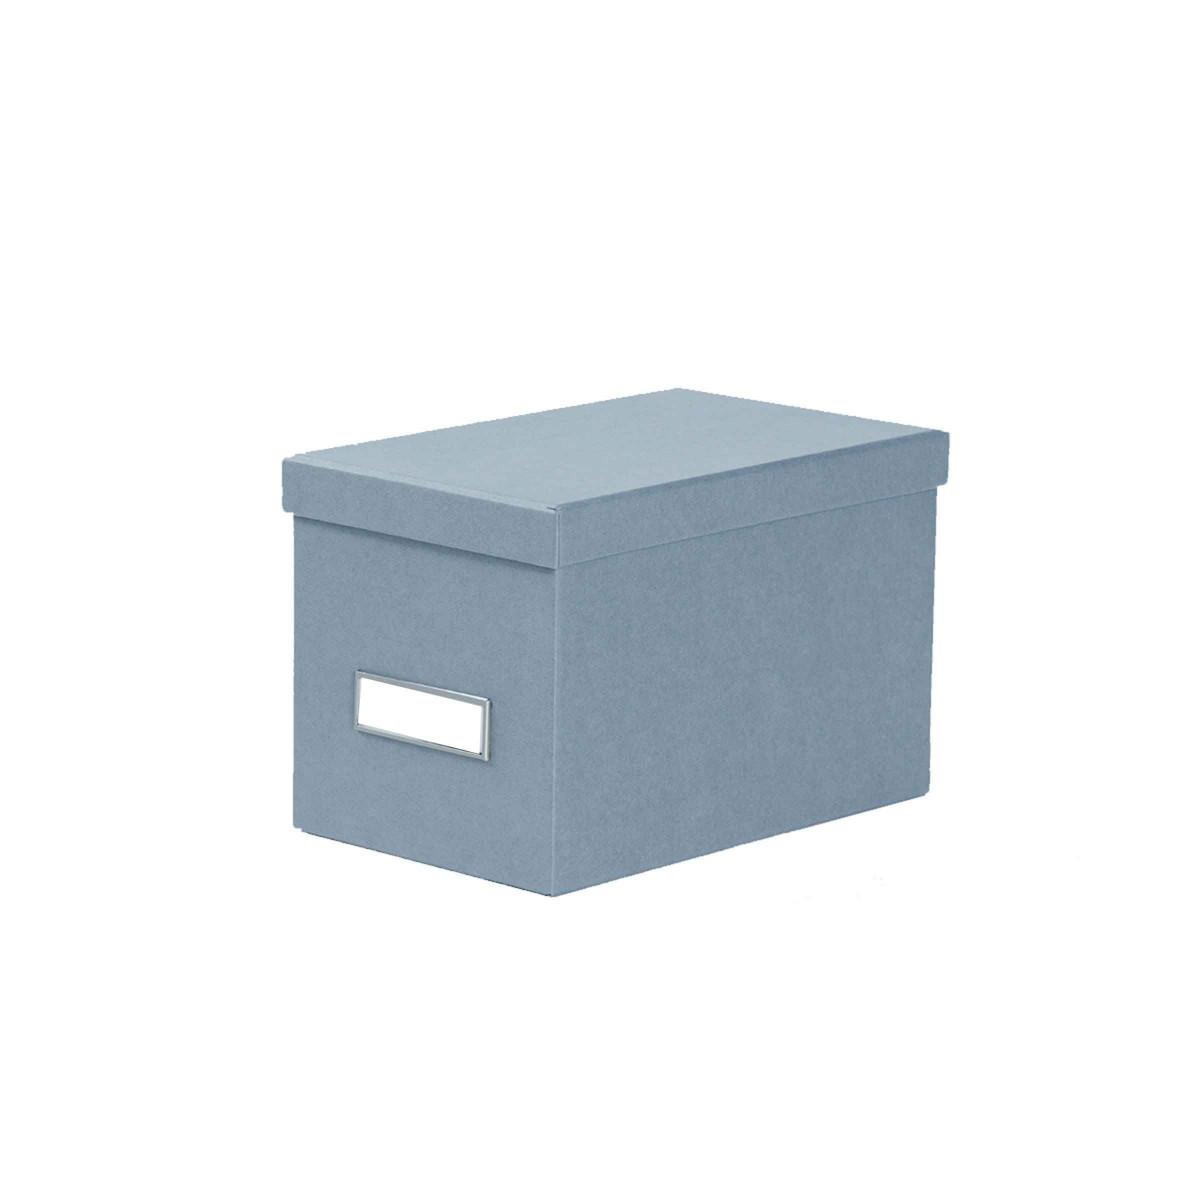 petite bo te en carton bleu gris. Black Bedroom Furniture Sets. Home Design Ideas